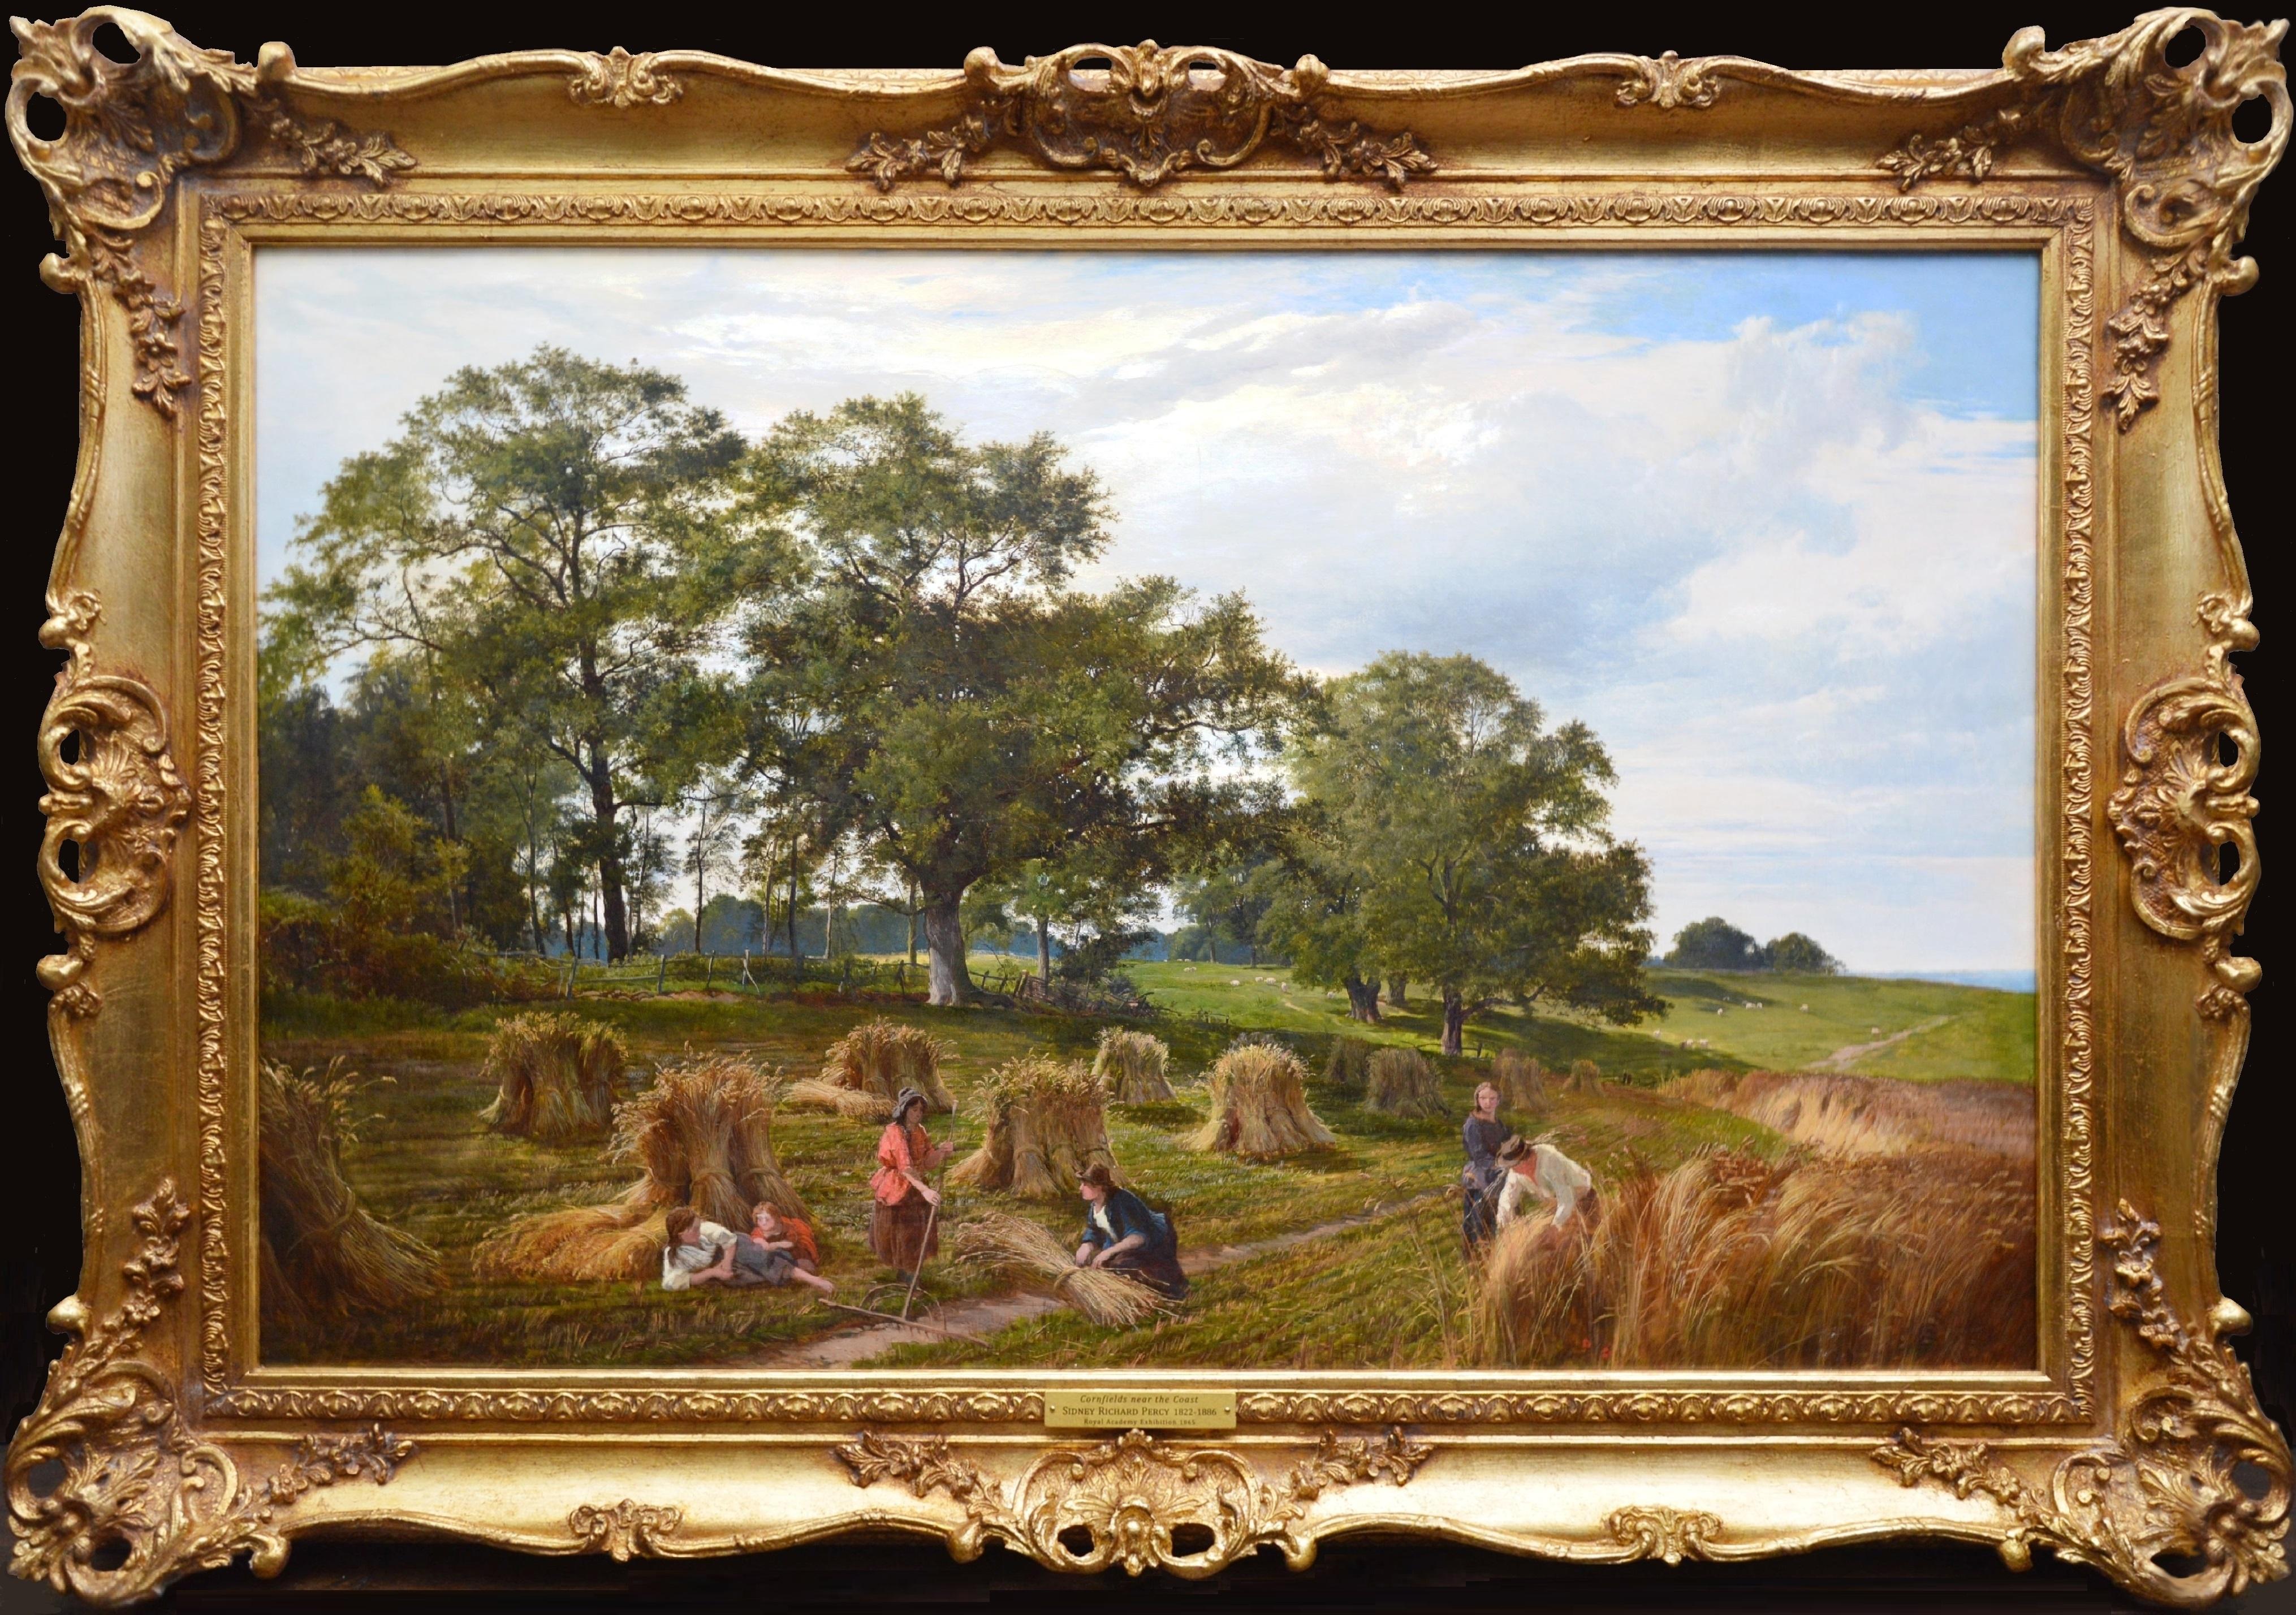 Cornfields near the Coast - Large 19th Century Royal Academy Oil Painting 1865